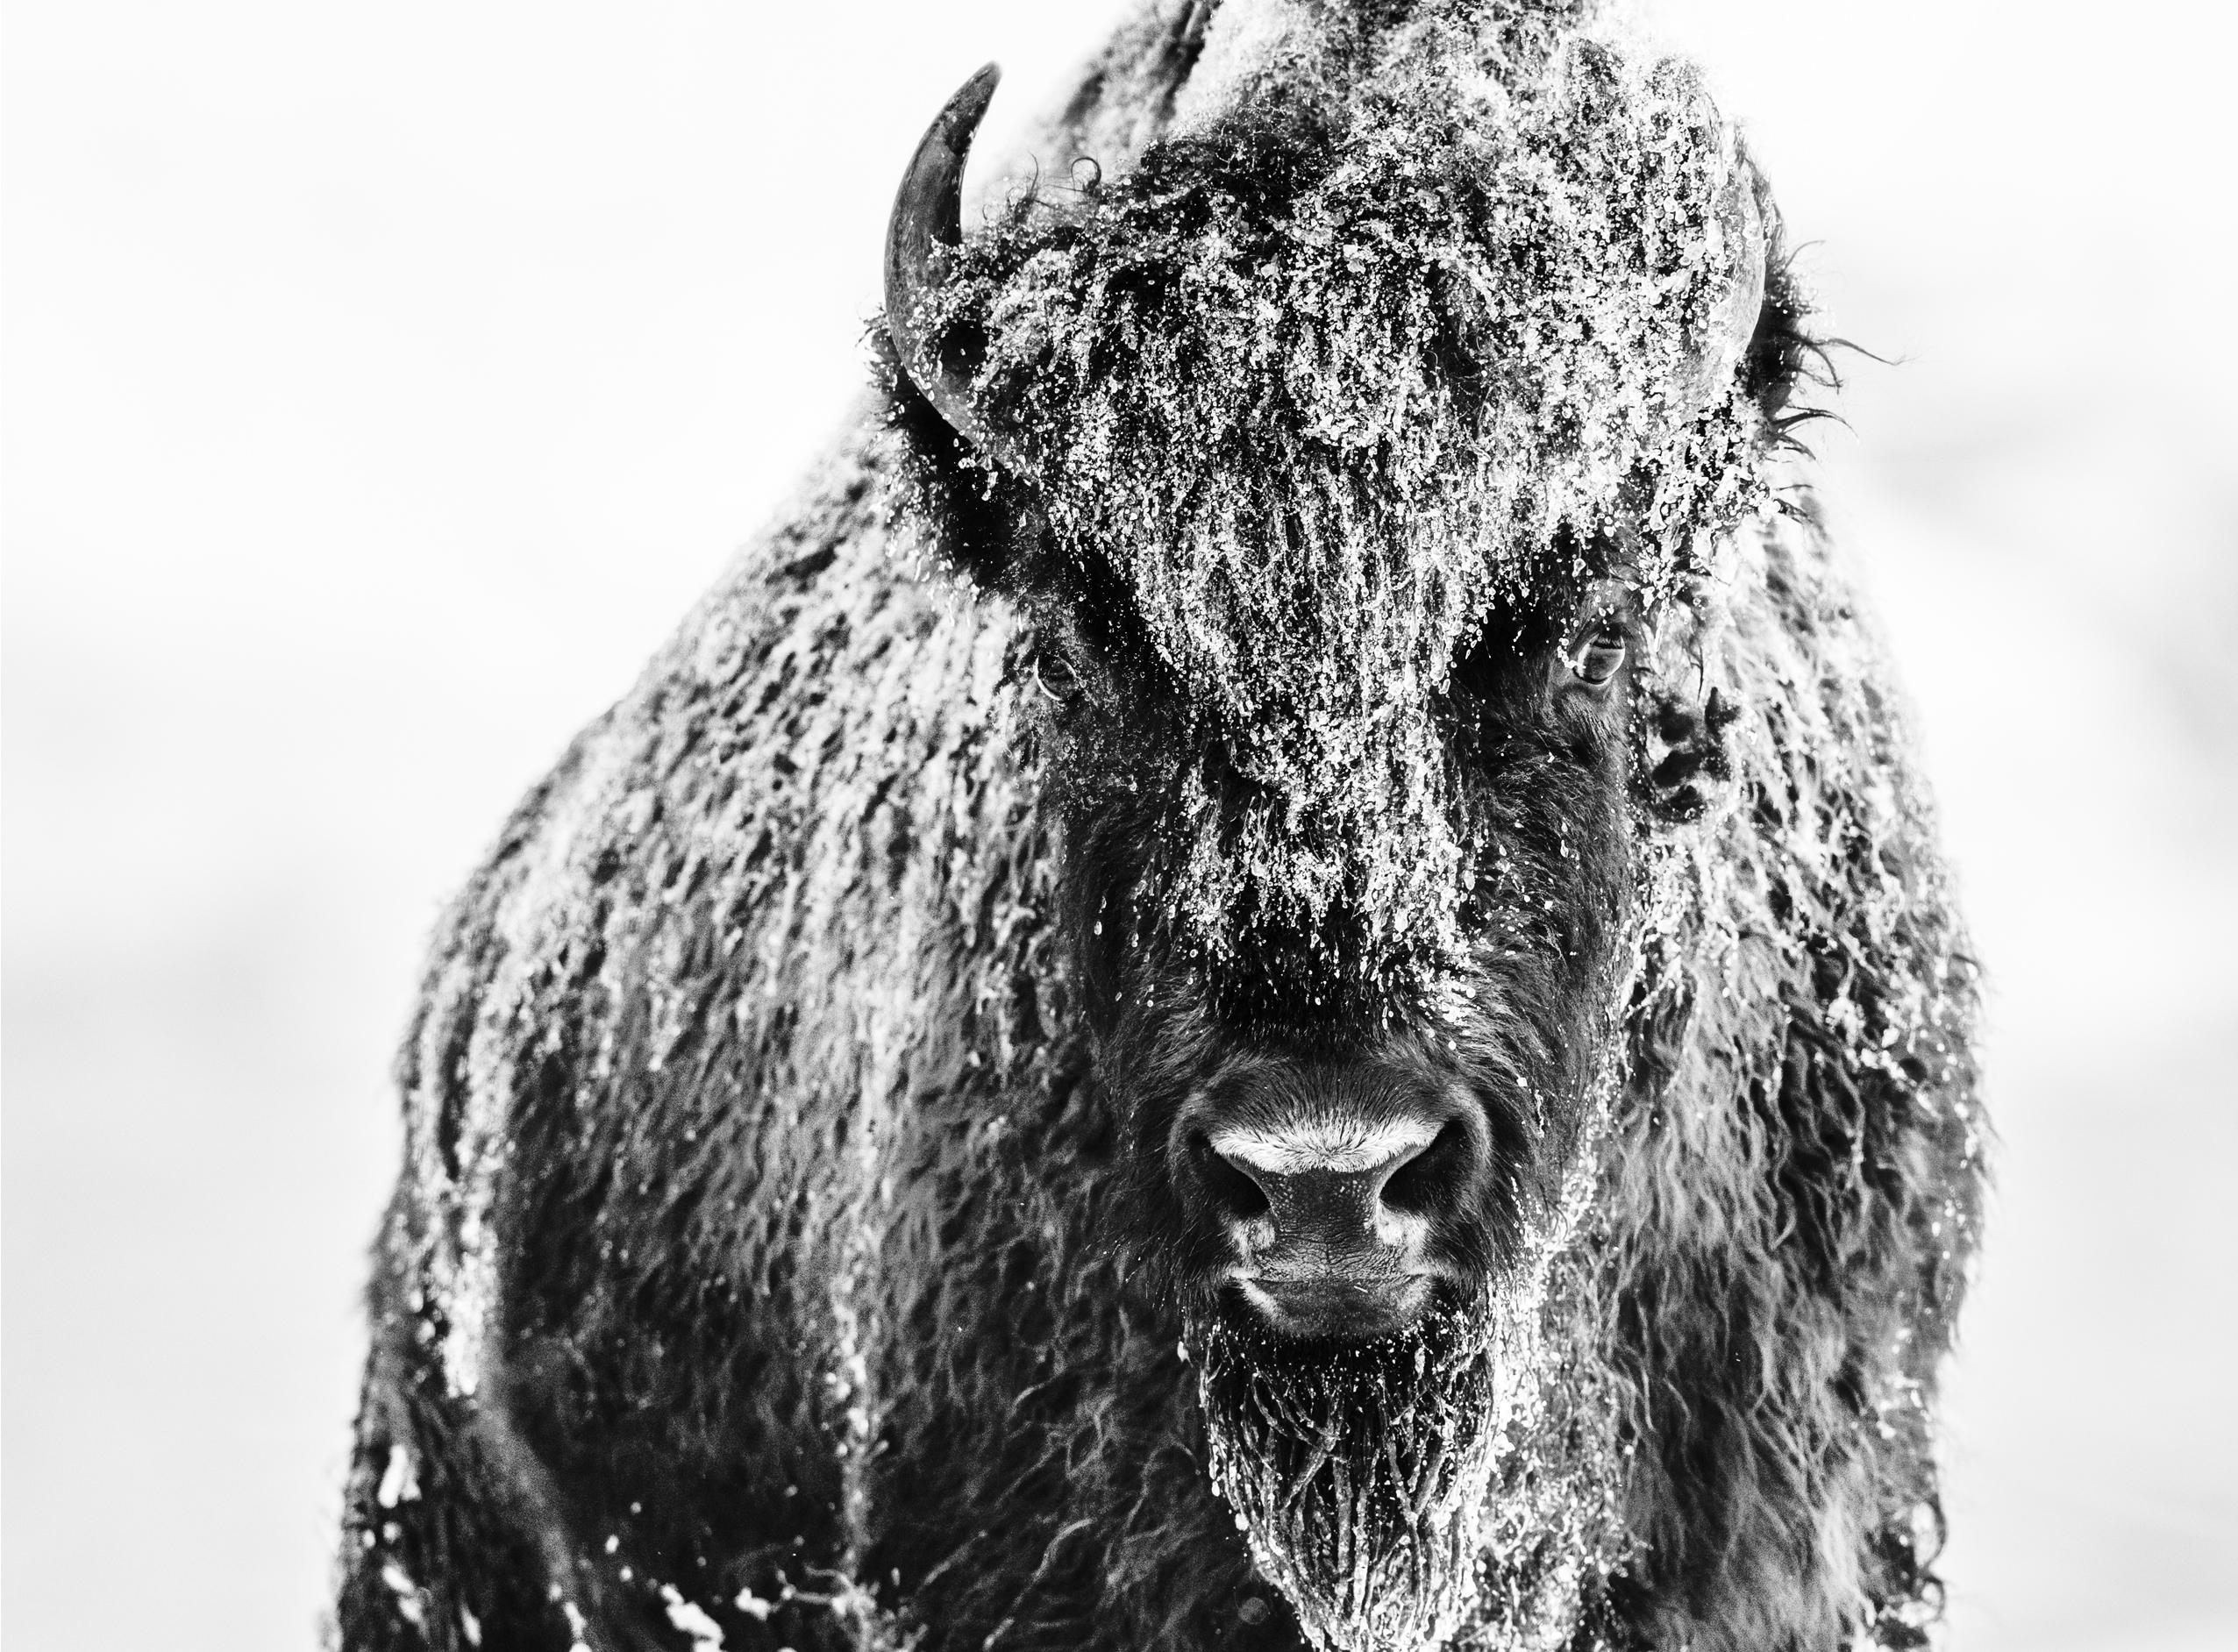 David Yarrow - The Beast